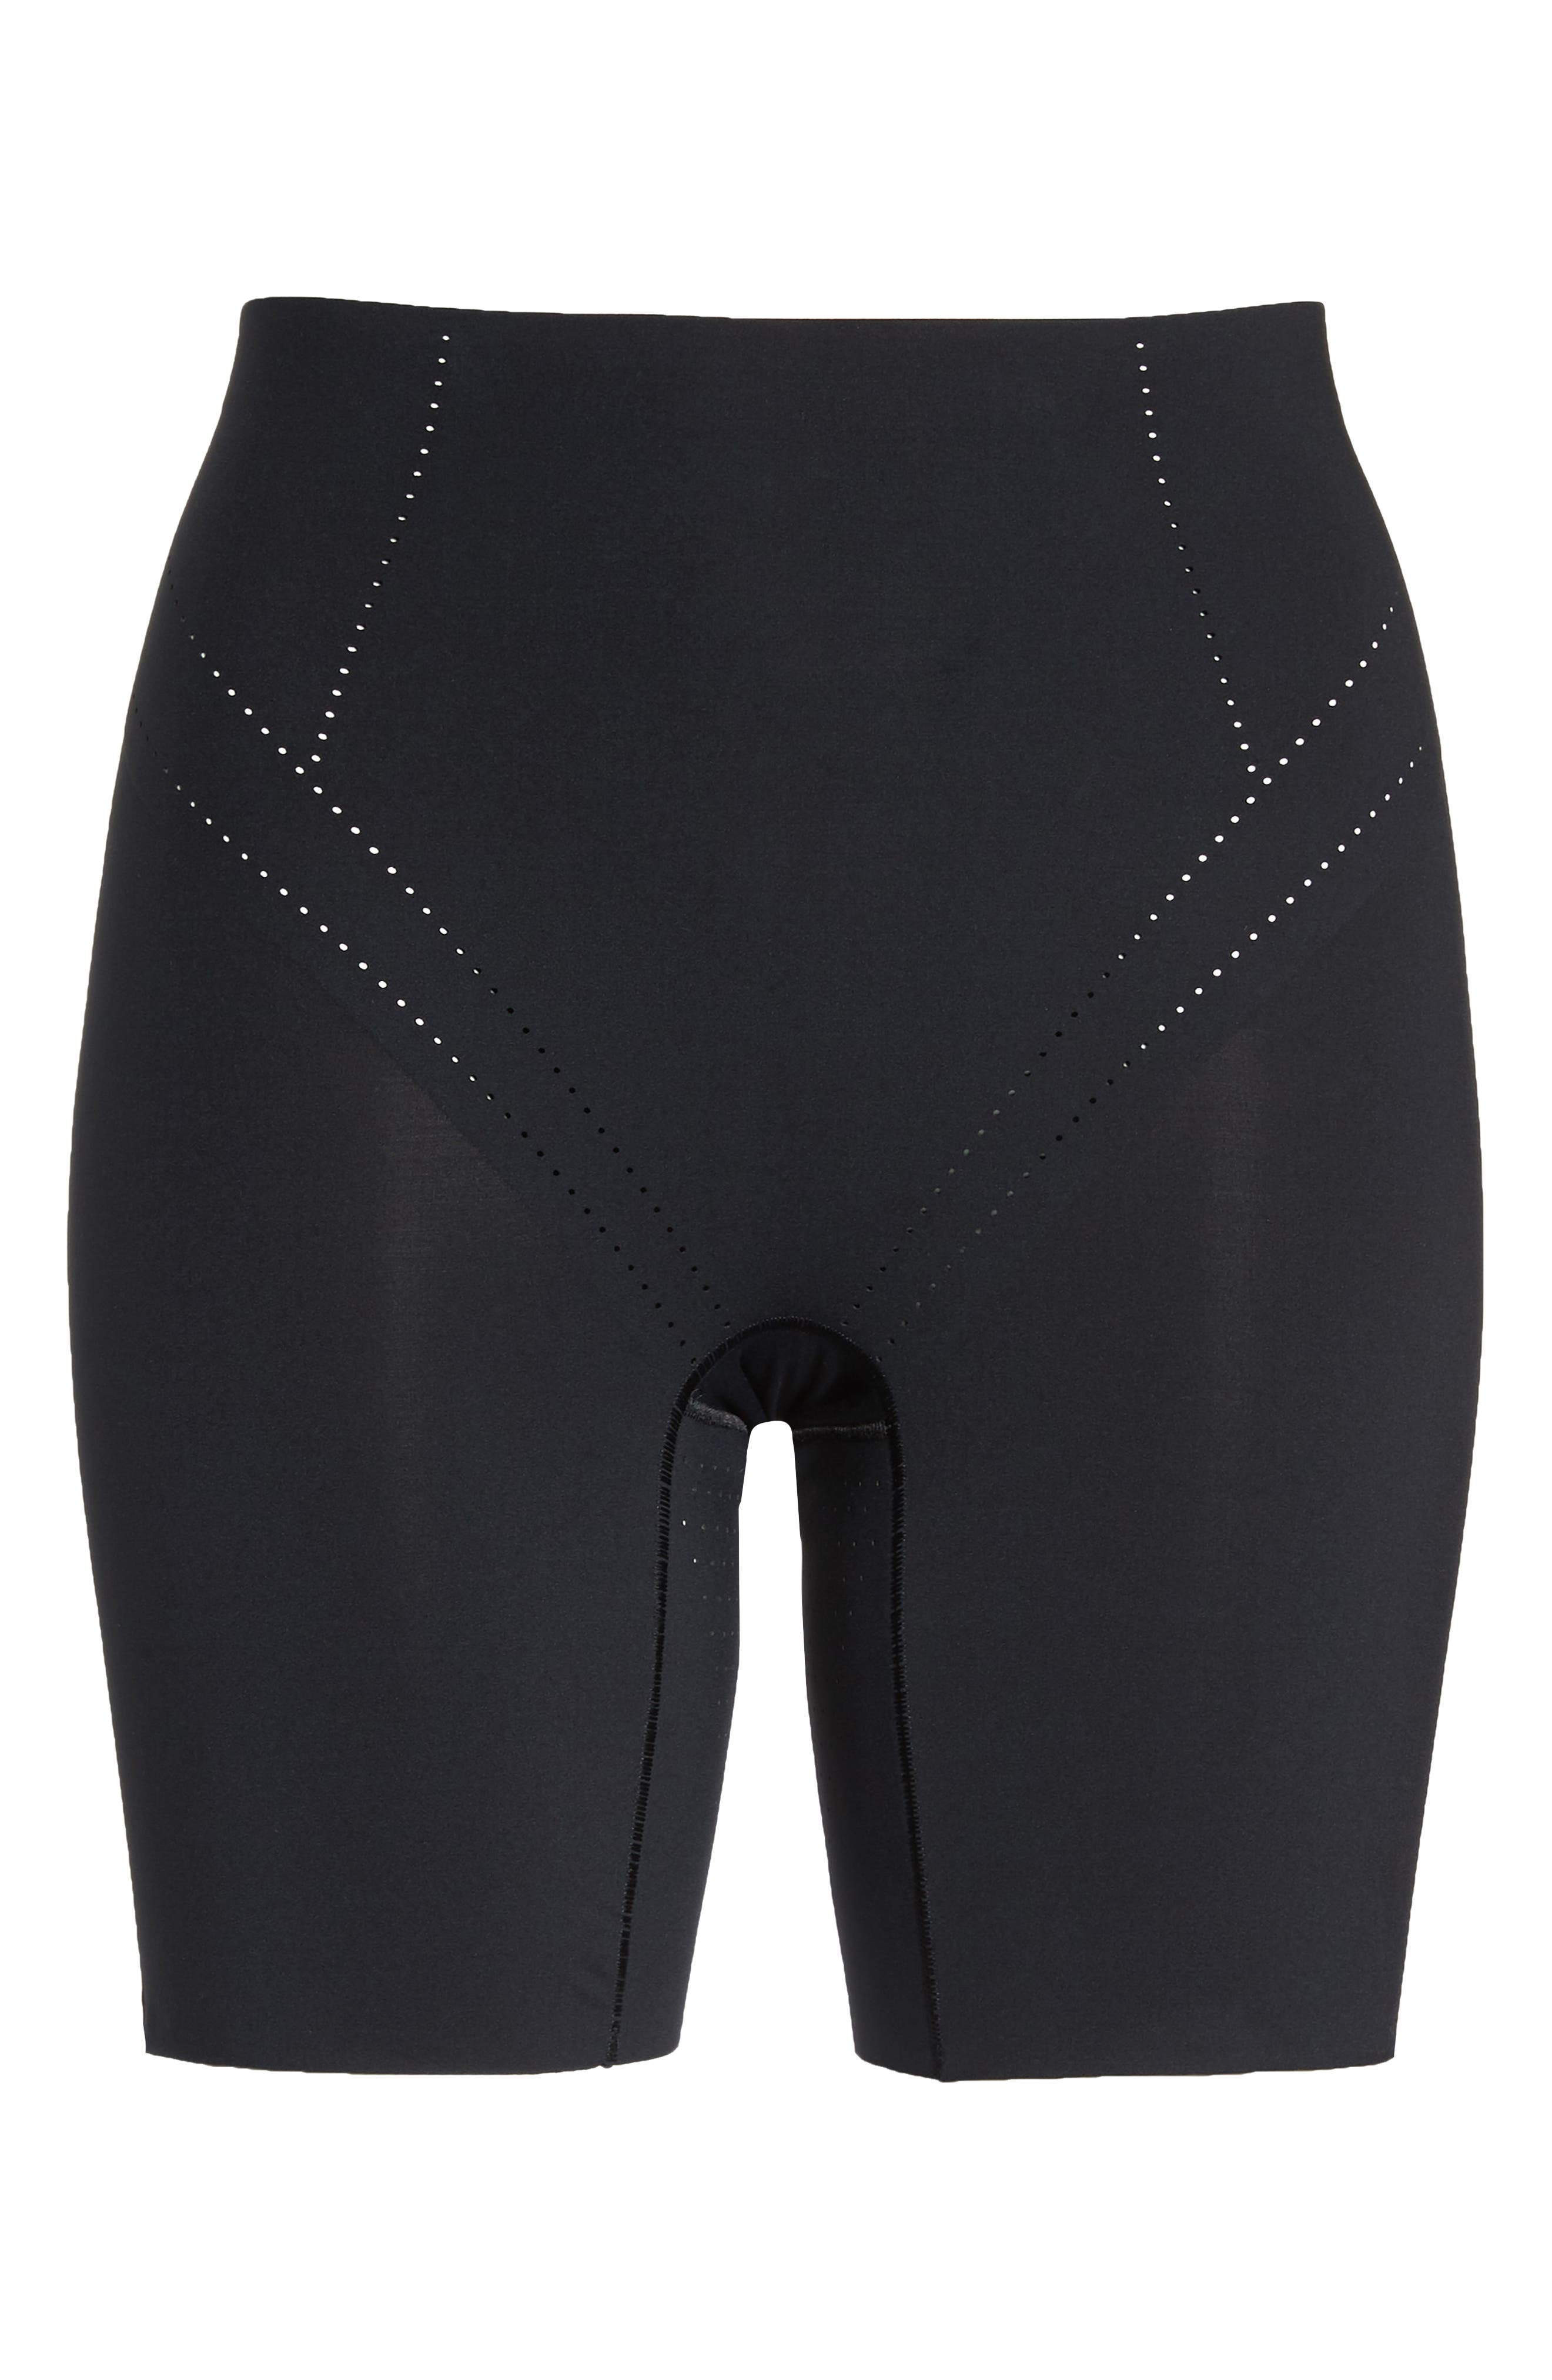 Shape Air Shaper Shorts,                             Alternate thumbnail 6, color,                             BLACK